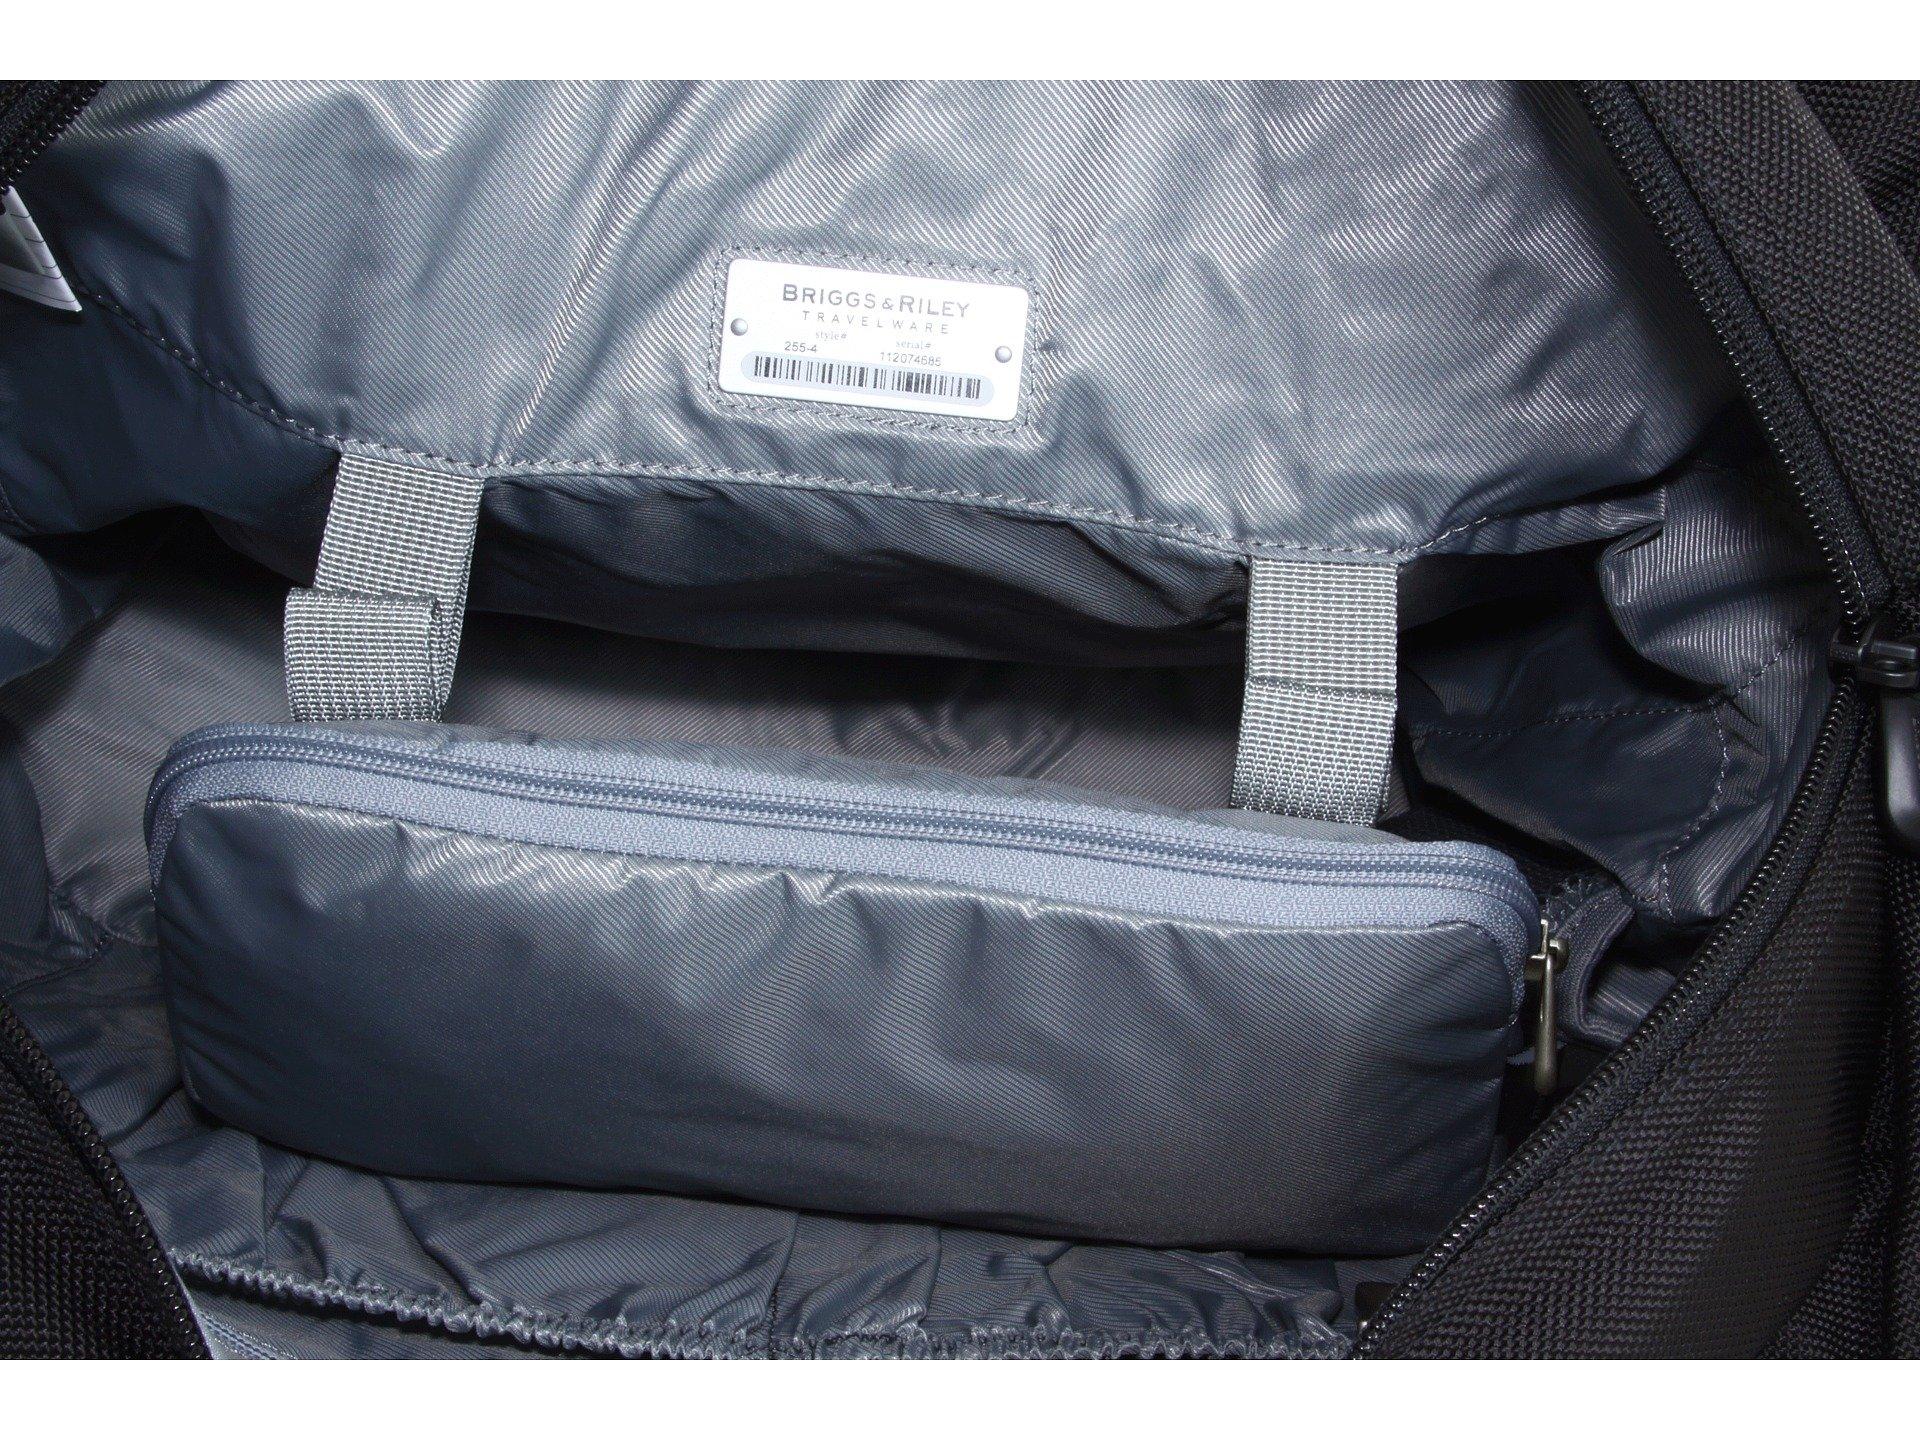 Briggs Riley amp; Large Shopping Bag Tote Baseline Black OOqrwxB4